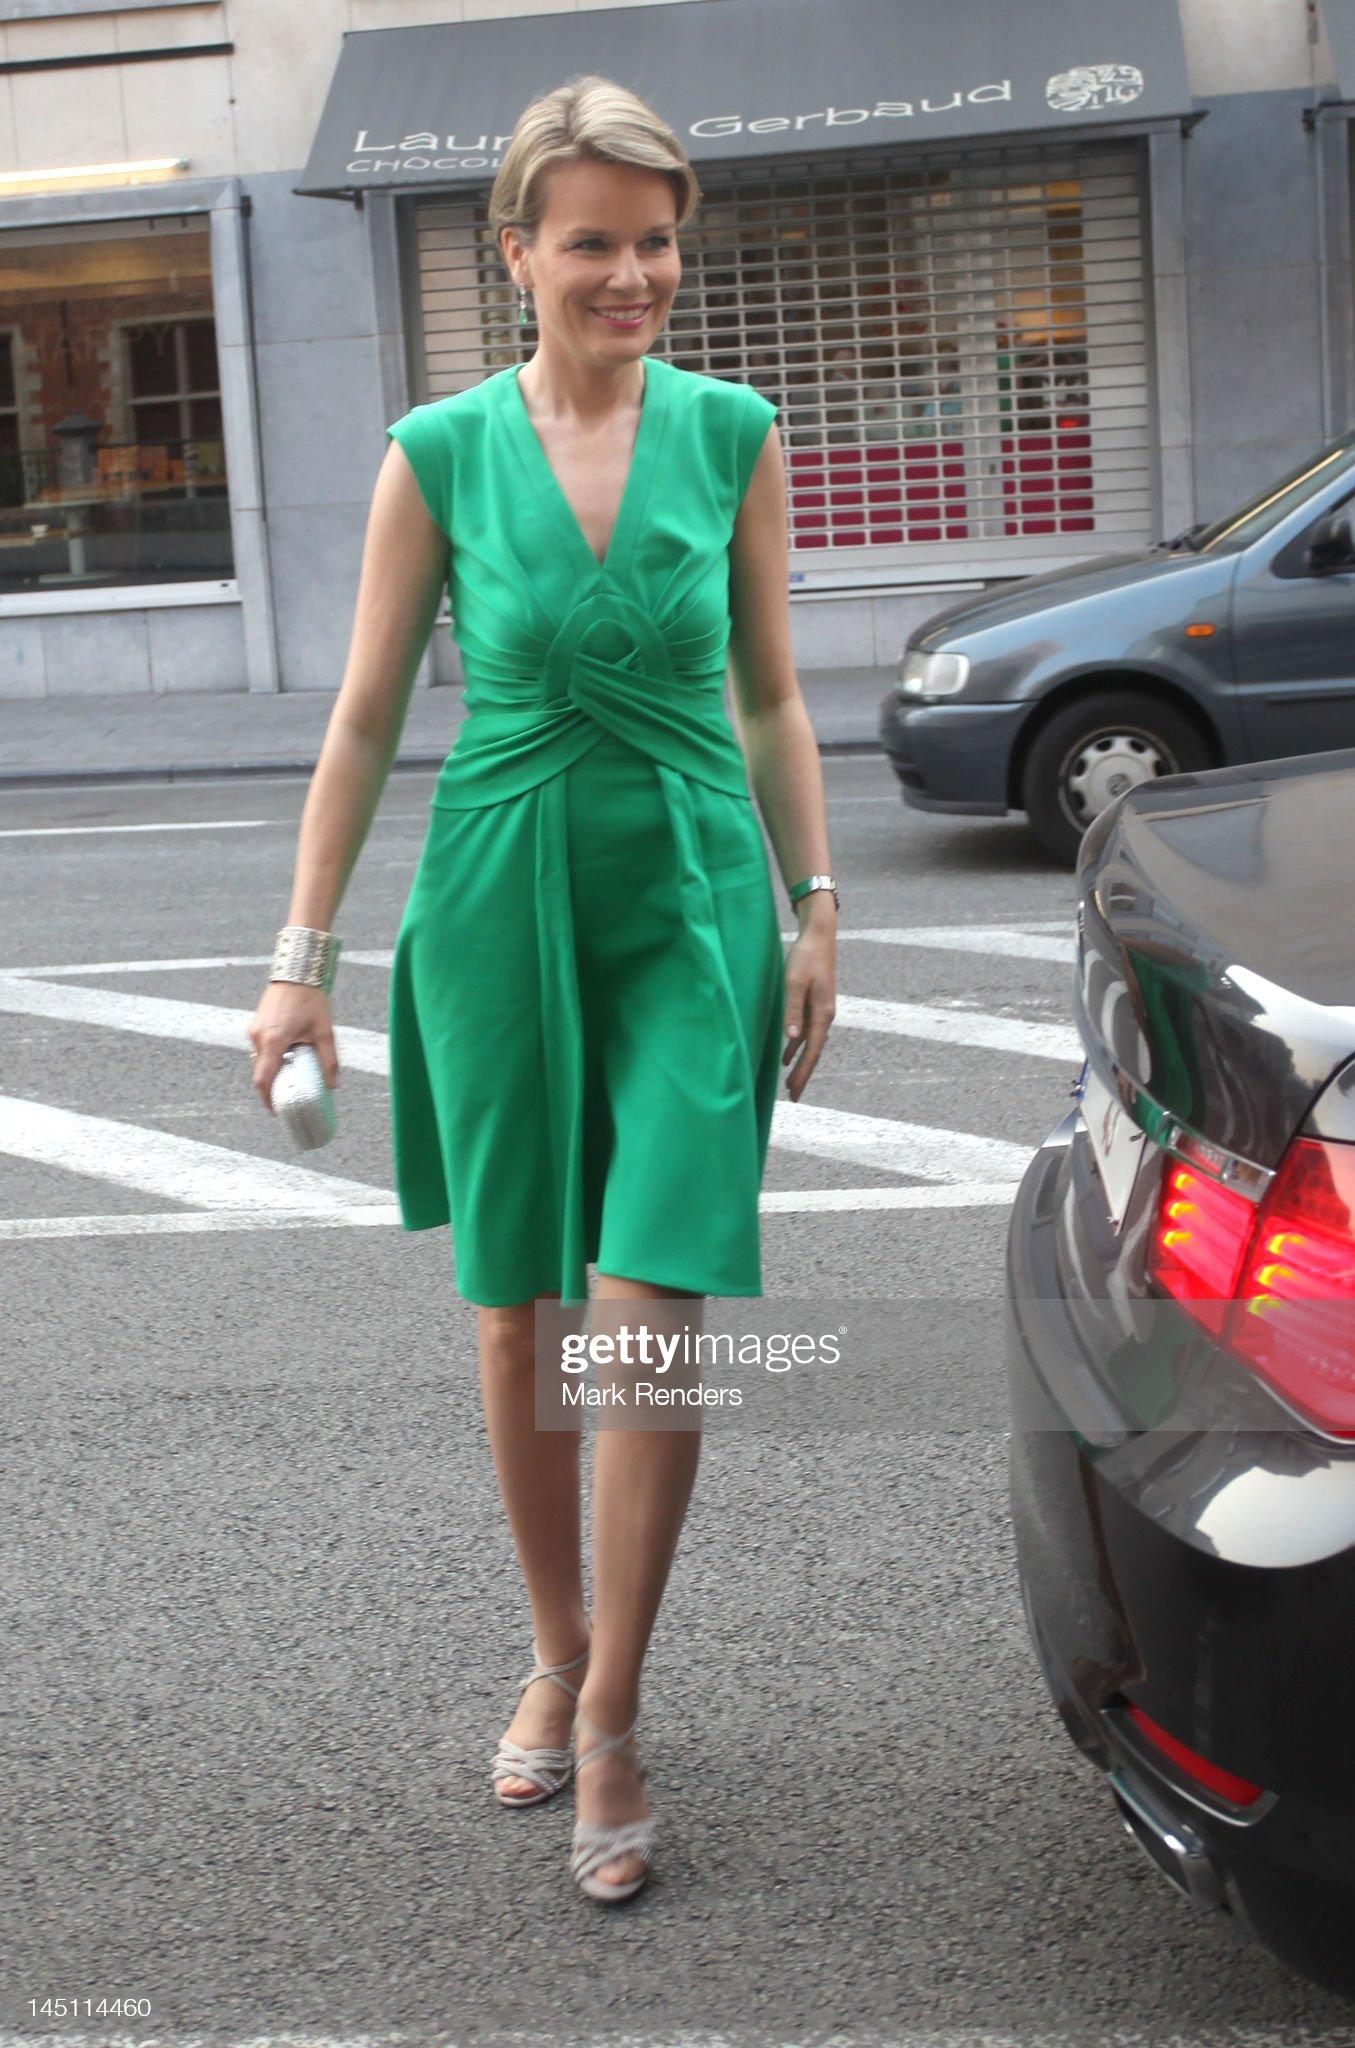 Вечерние наряды Королевы Матильды Prince Philippe And Princess Mathilde Attend 'Queen Elisabeth Violon Award' 2012 : News Photo